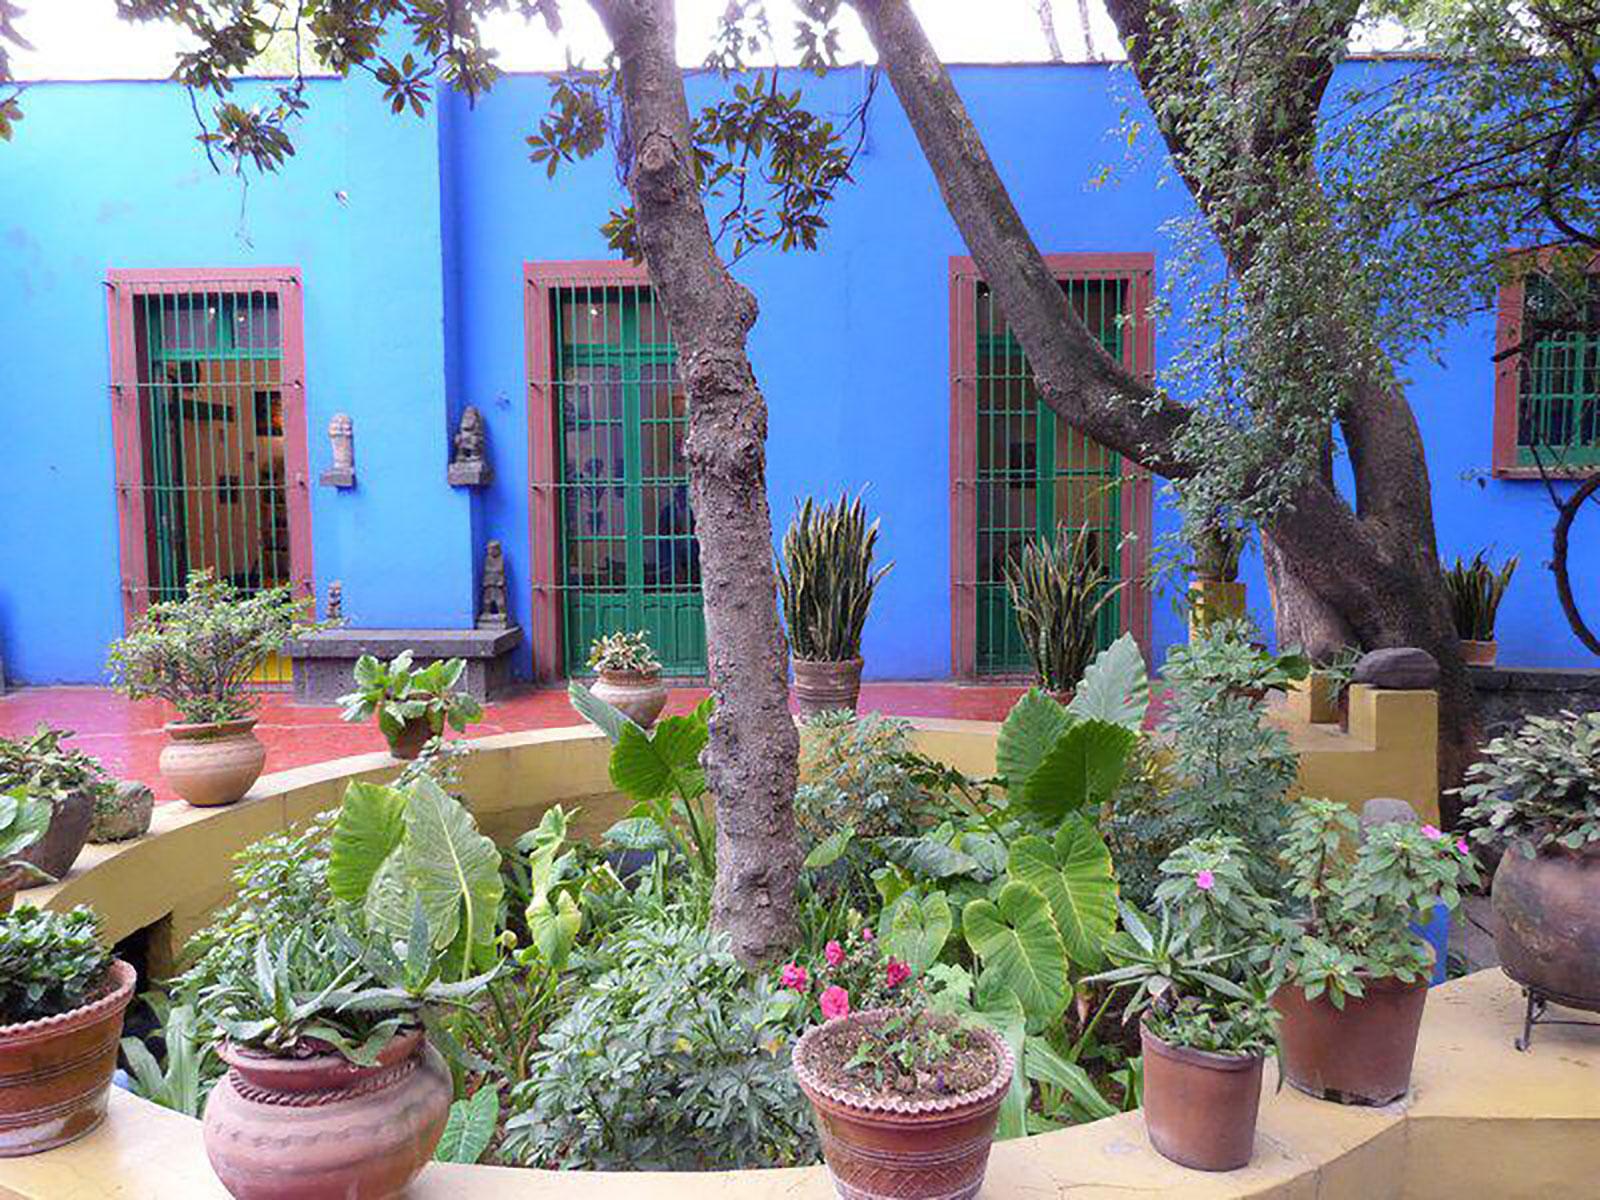 Hammocks_and_Ruins_Riviera_Maya_Mexico_Stories_Mayan_Mythology_Towns_Cities_What_to_Do_Mexico_City_Cuidad_17.jpg